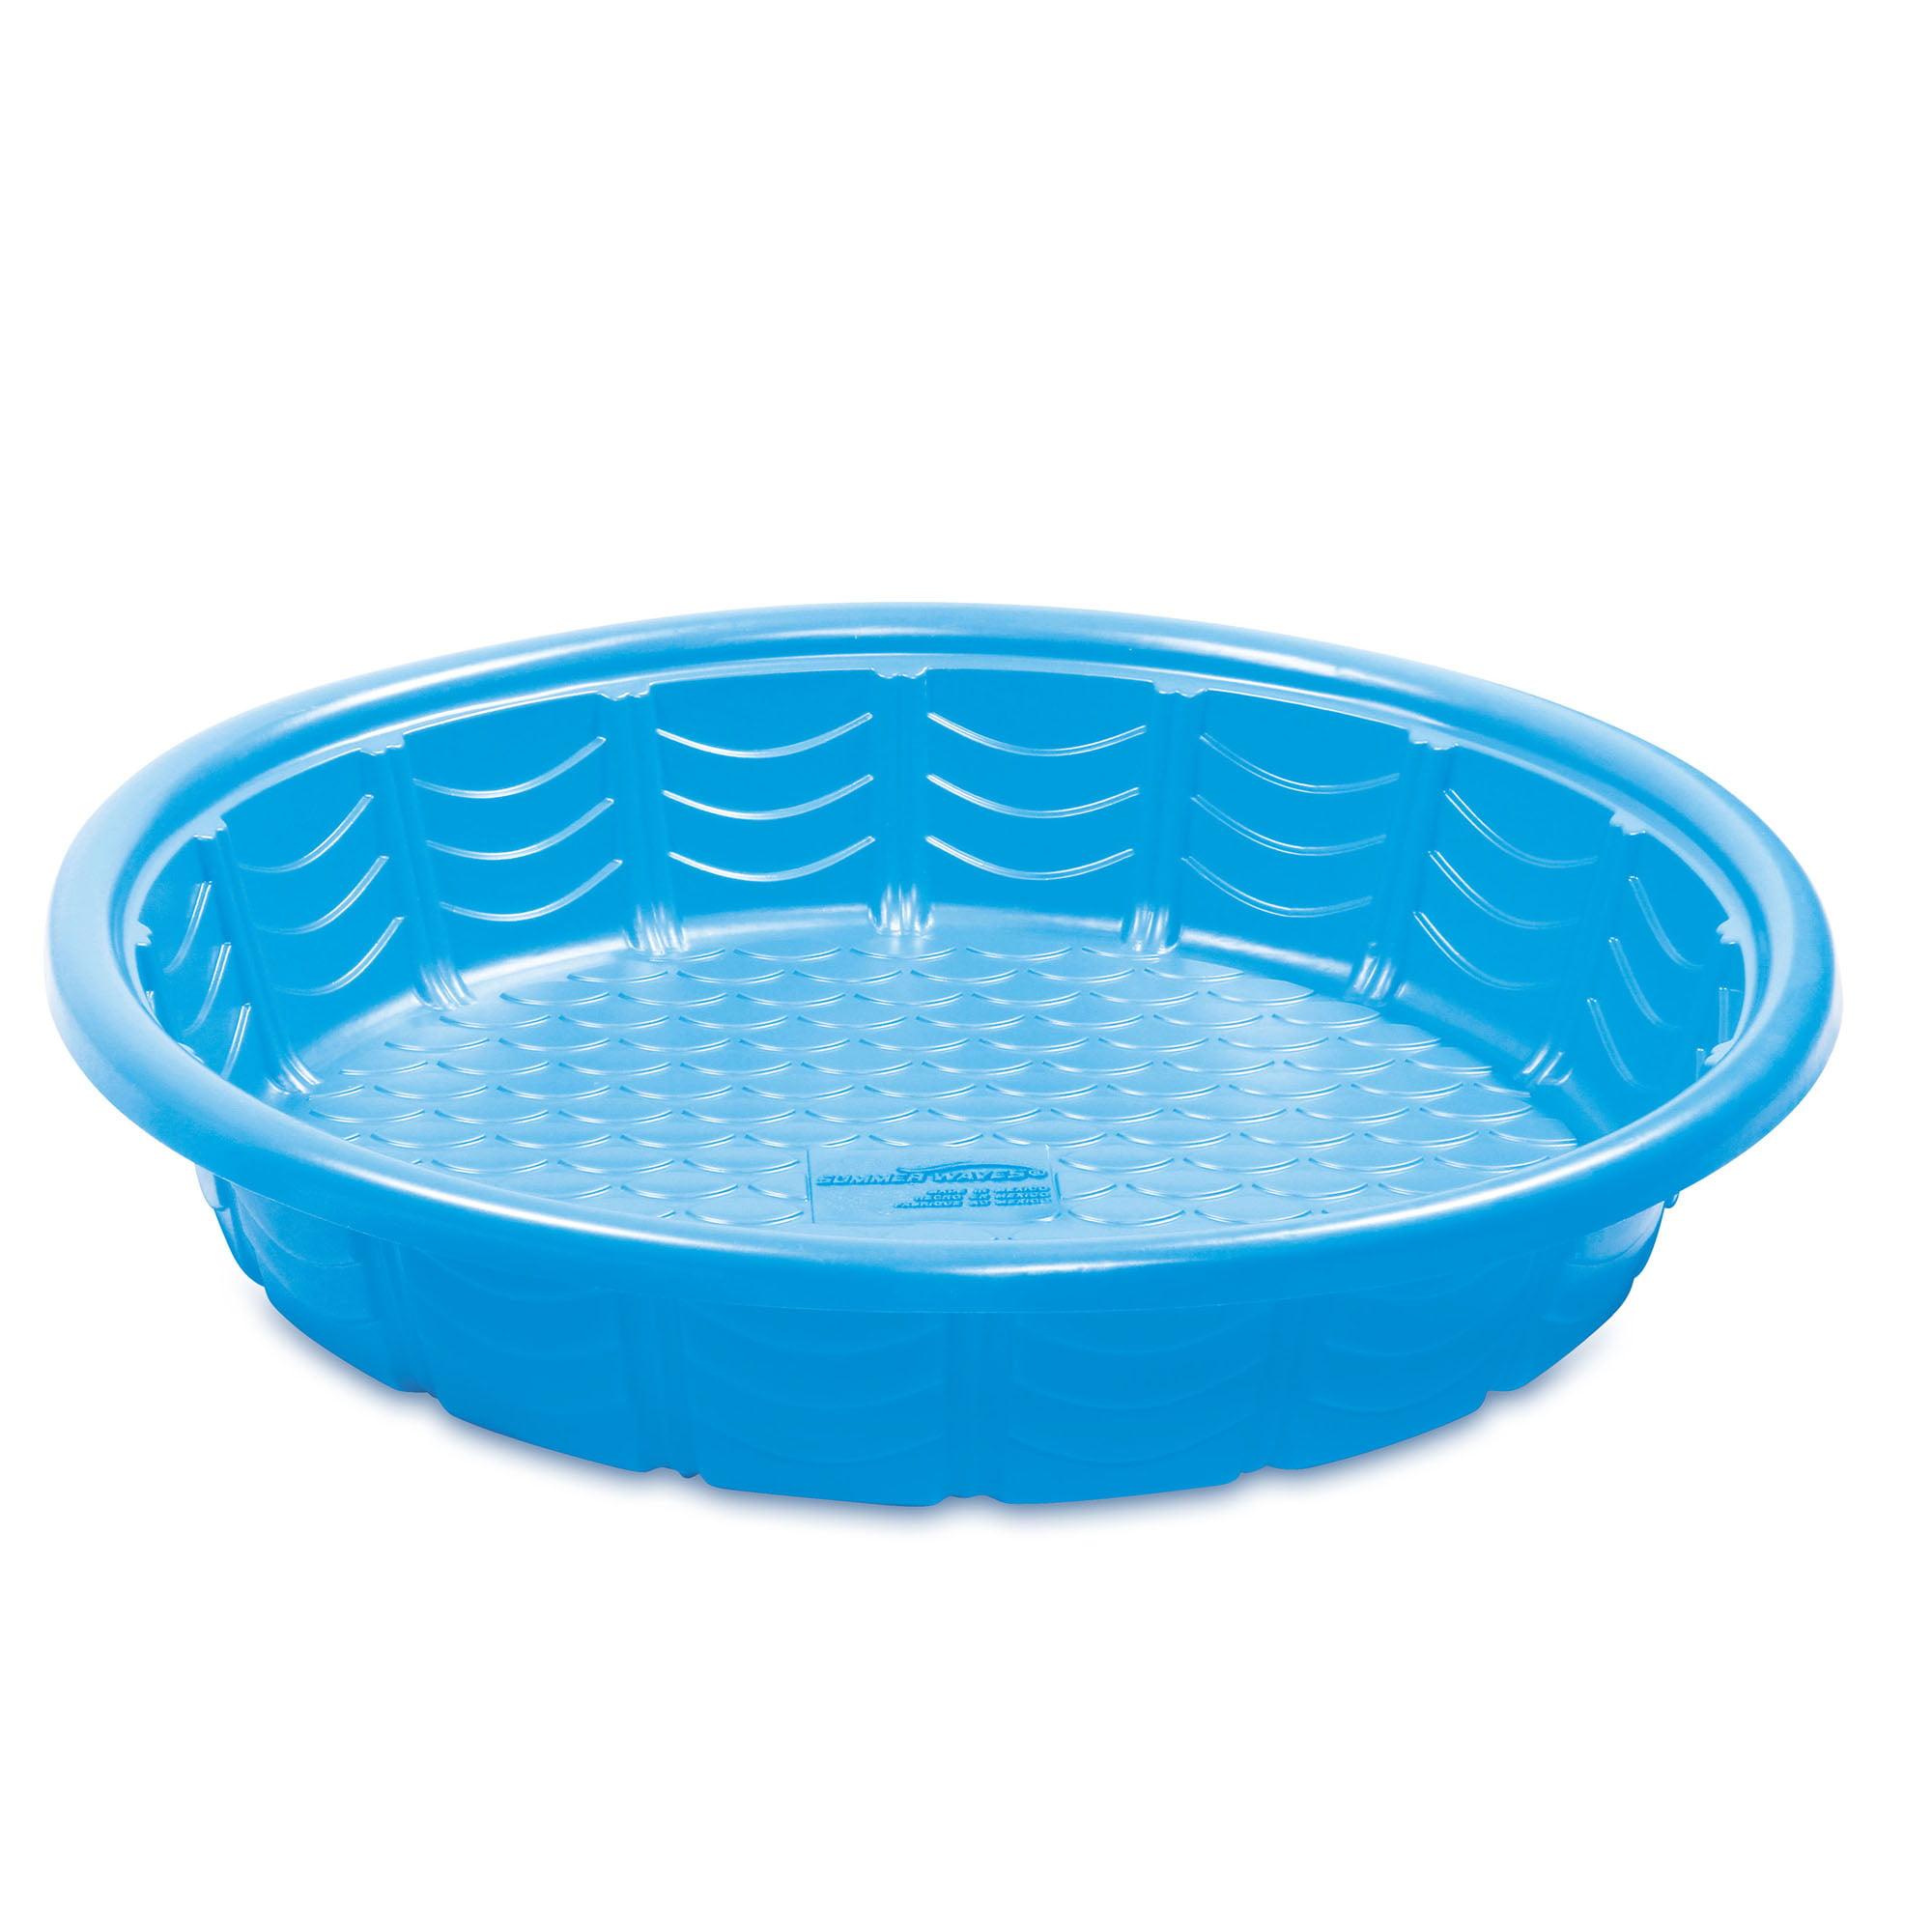 Summer Waves 59 Plastic Wading Kiddie Pool Blue Walmart Com Walmart Com